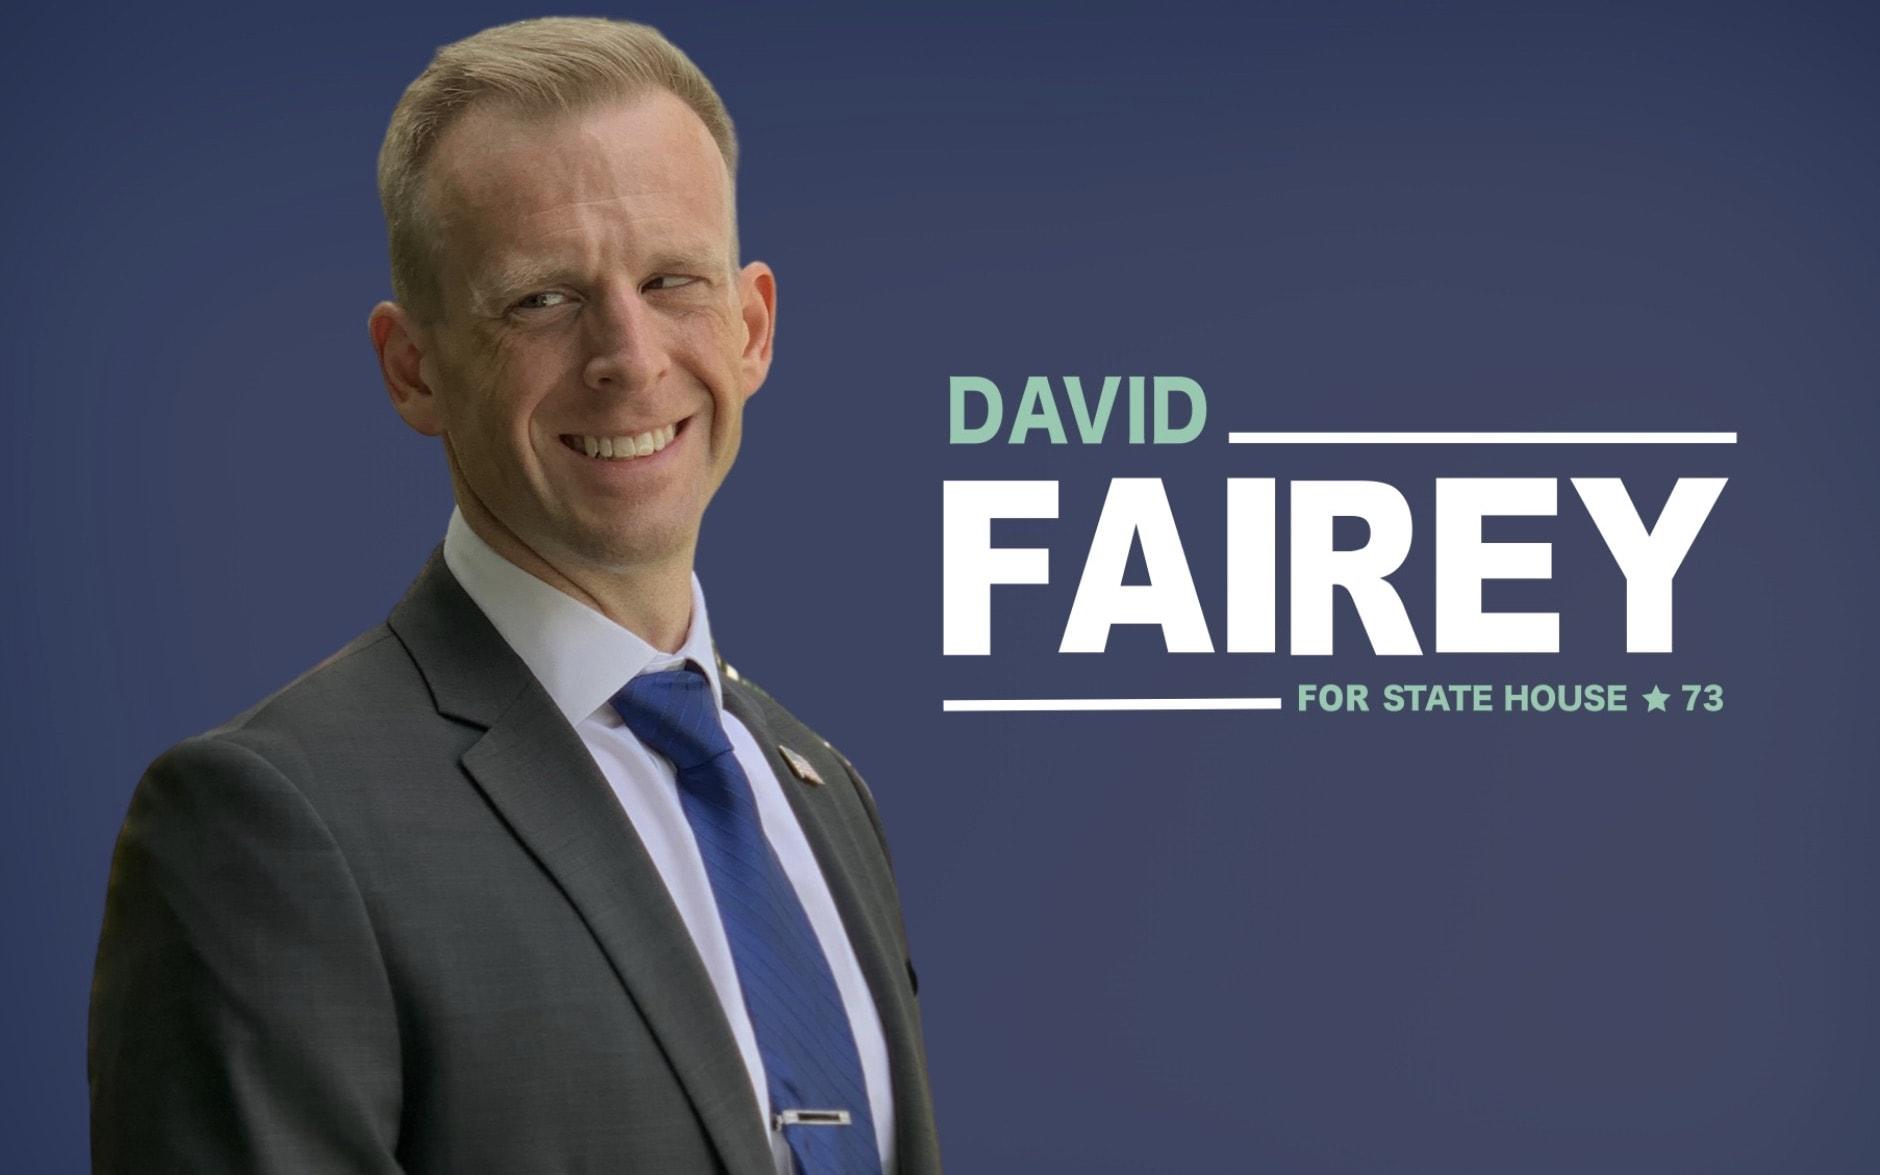 David Fairey